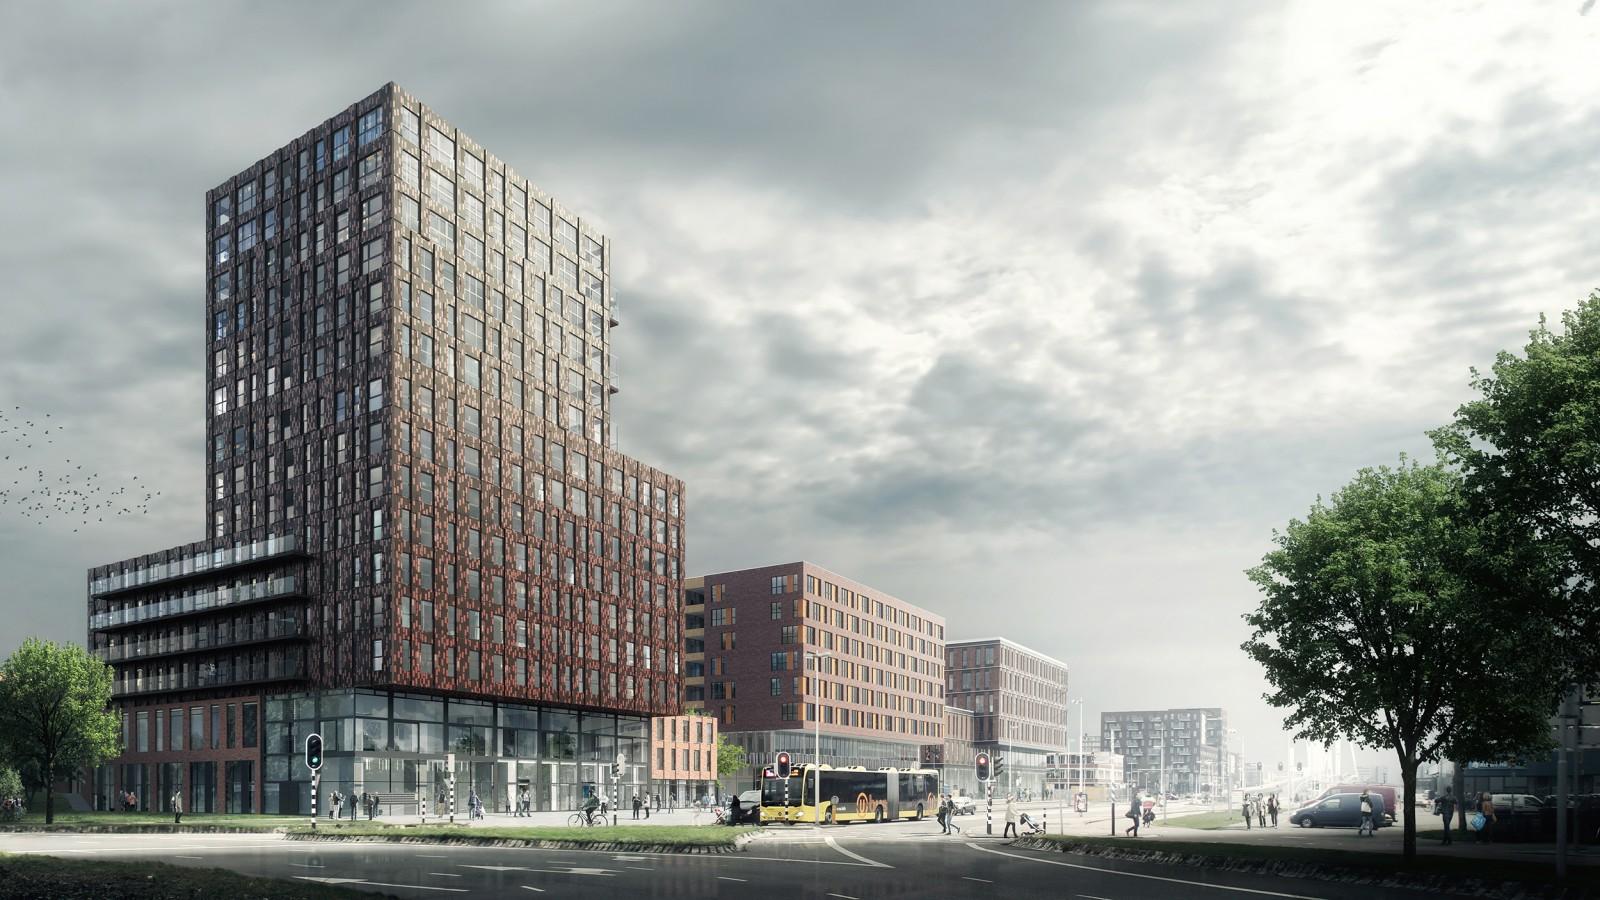 De Verkenner Utrecht MEI Architecten